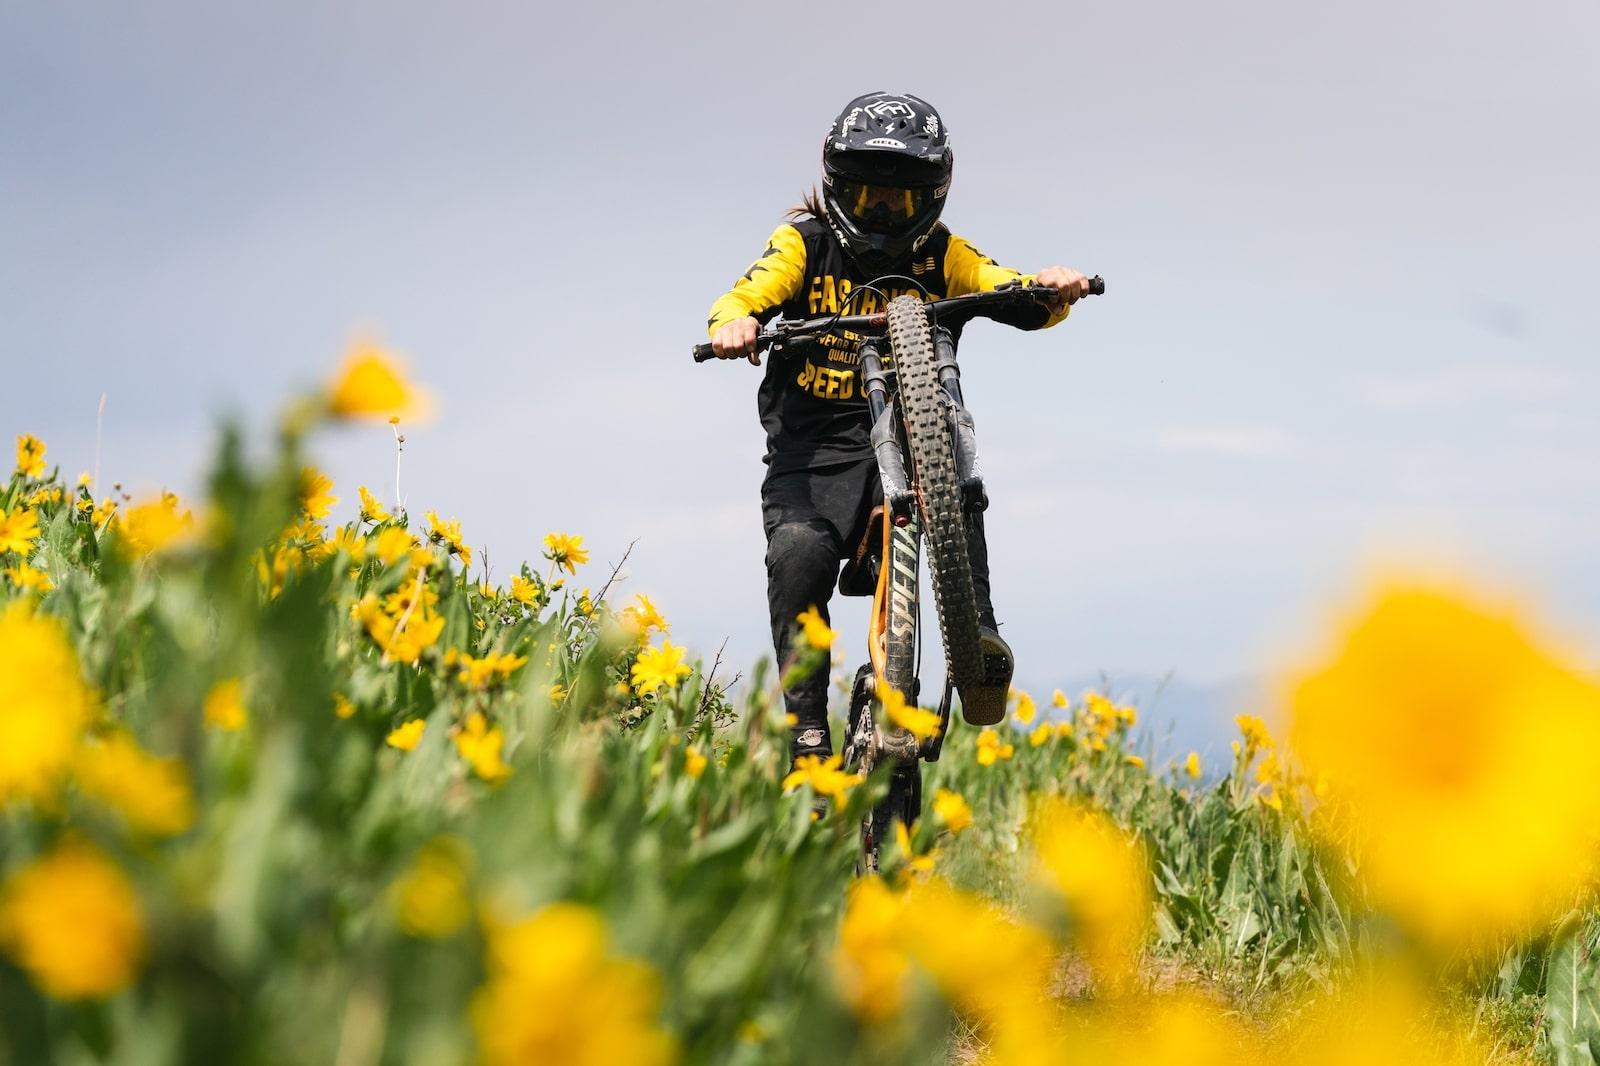 Image of a person mountain biking at Granby Ranch Mountain Ski Resort in Colorado